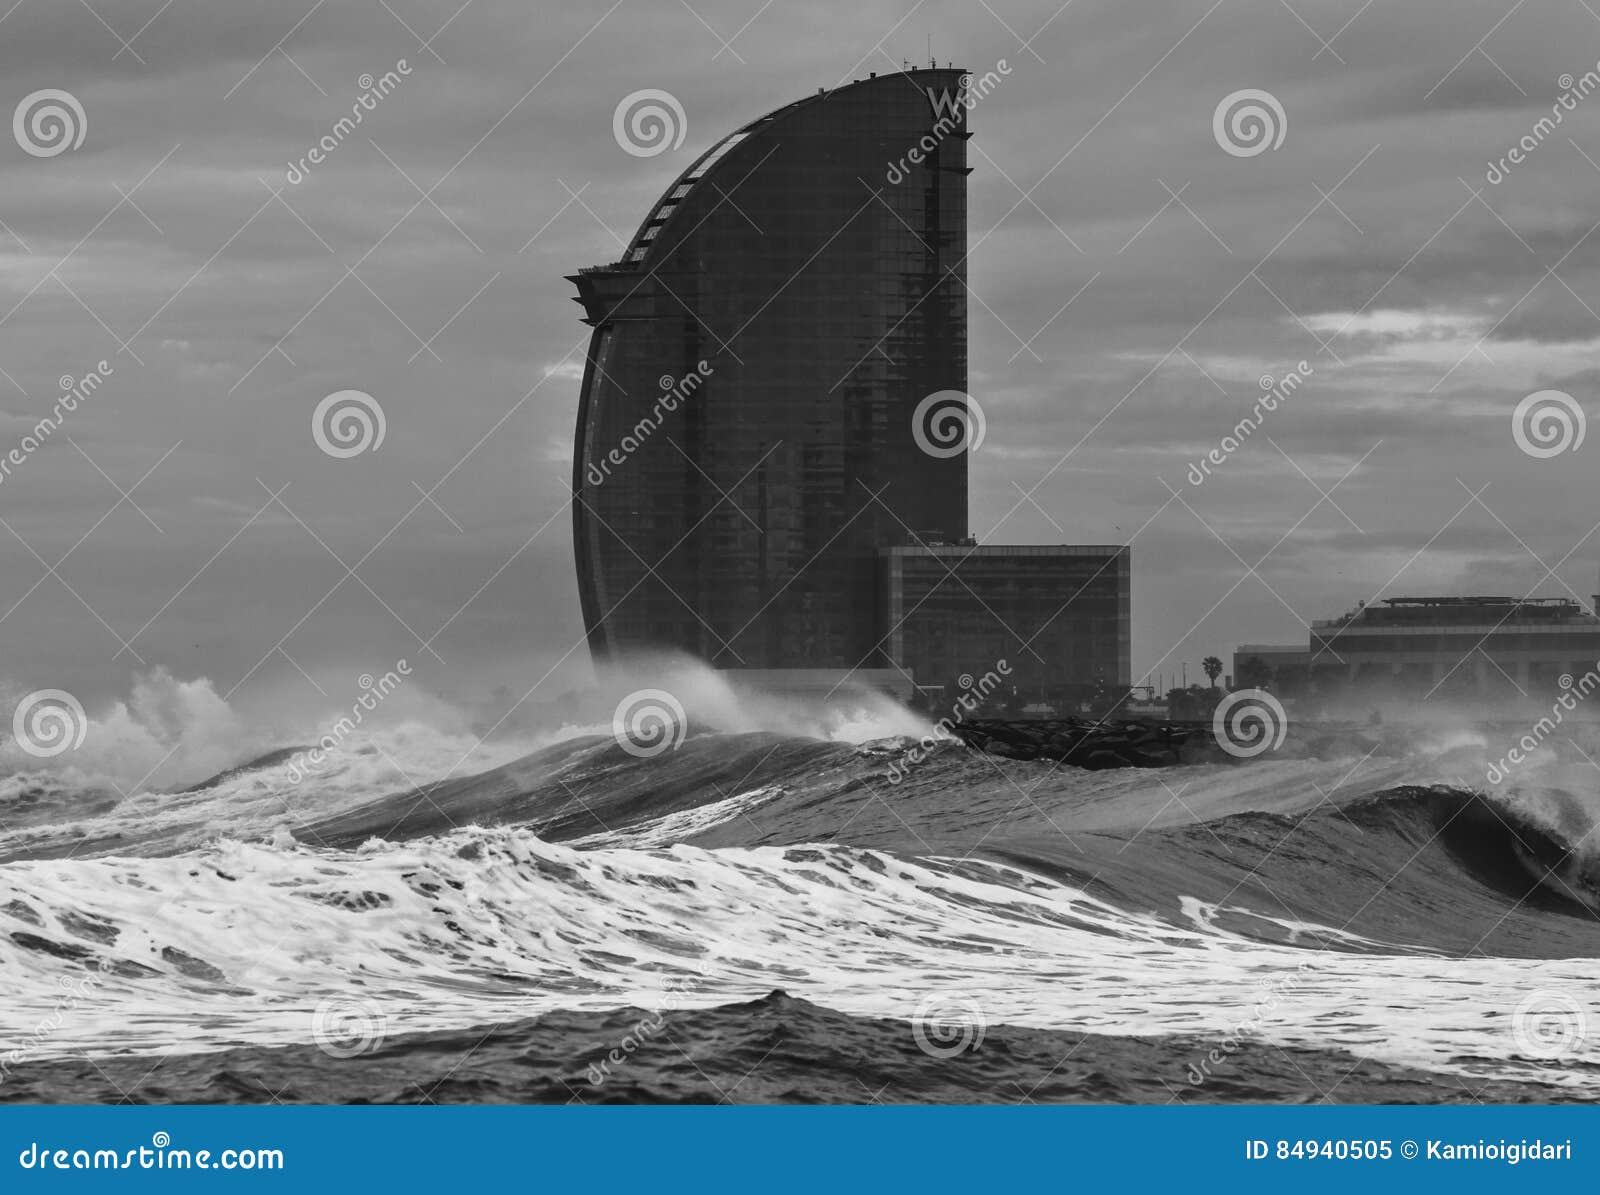 Barcelona W hotel in storm